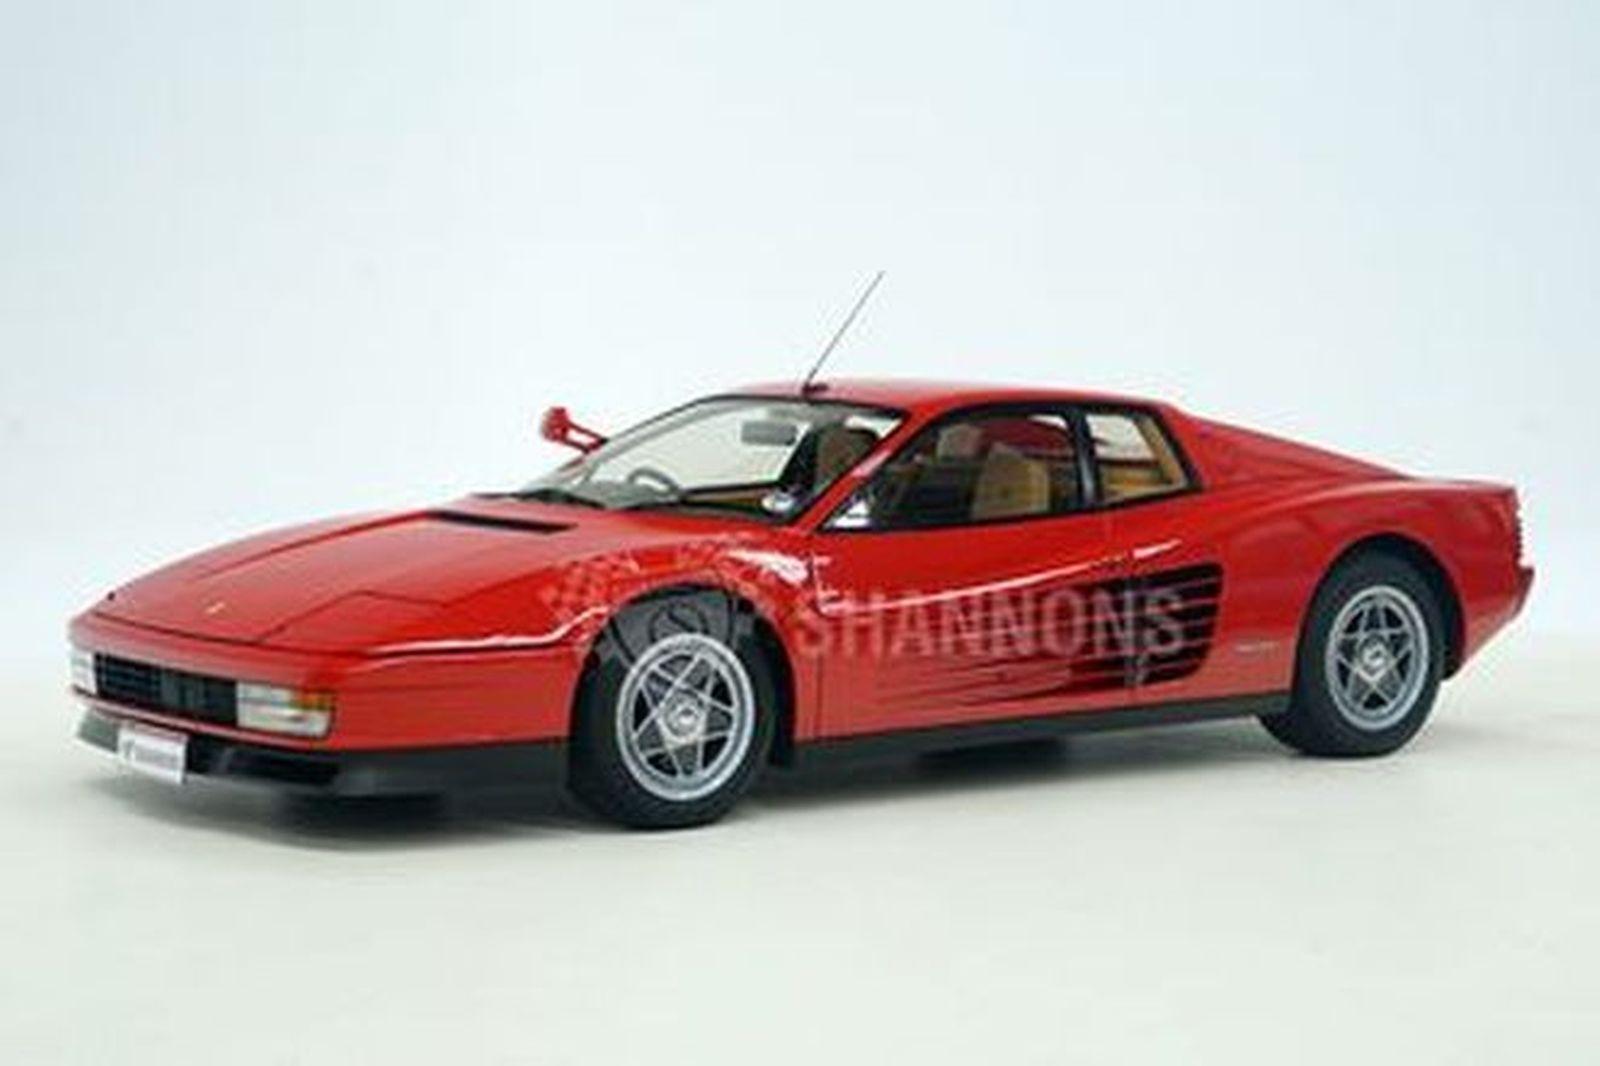 Ferrari Testarossa Coupe (Ex-Sir Elton John)